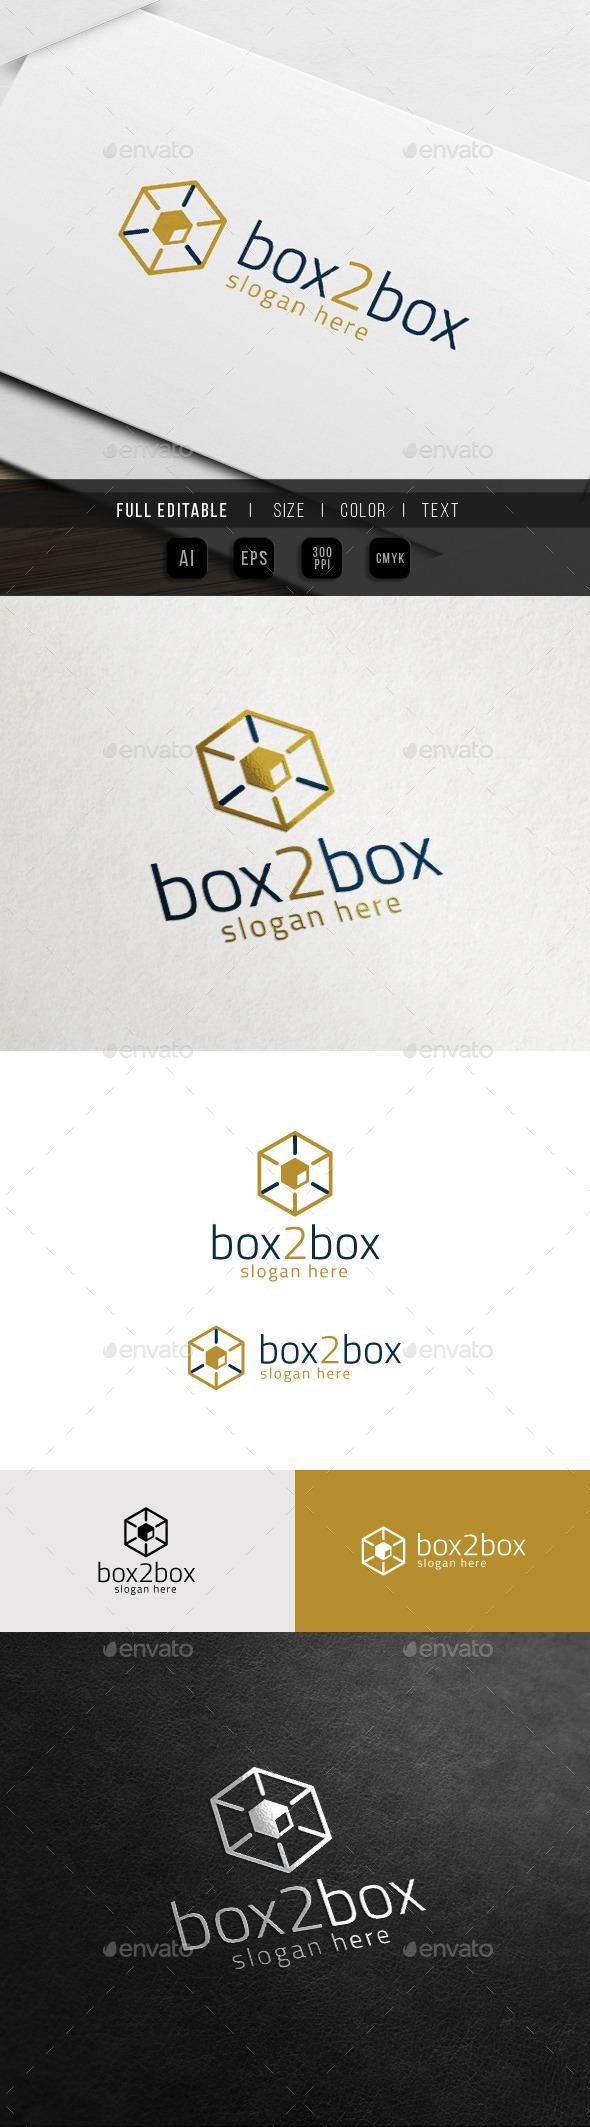 GraphicRiver Box Box Idea Hexa Gift Cube Hosting 10998436